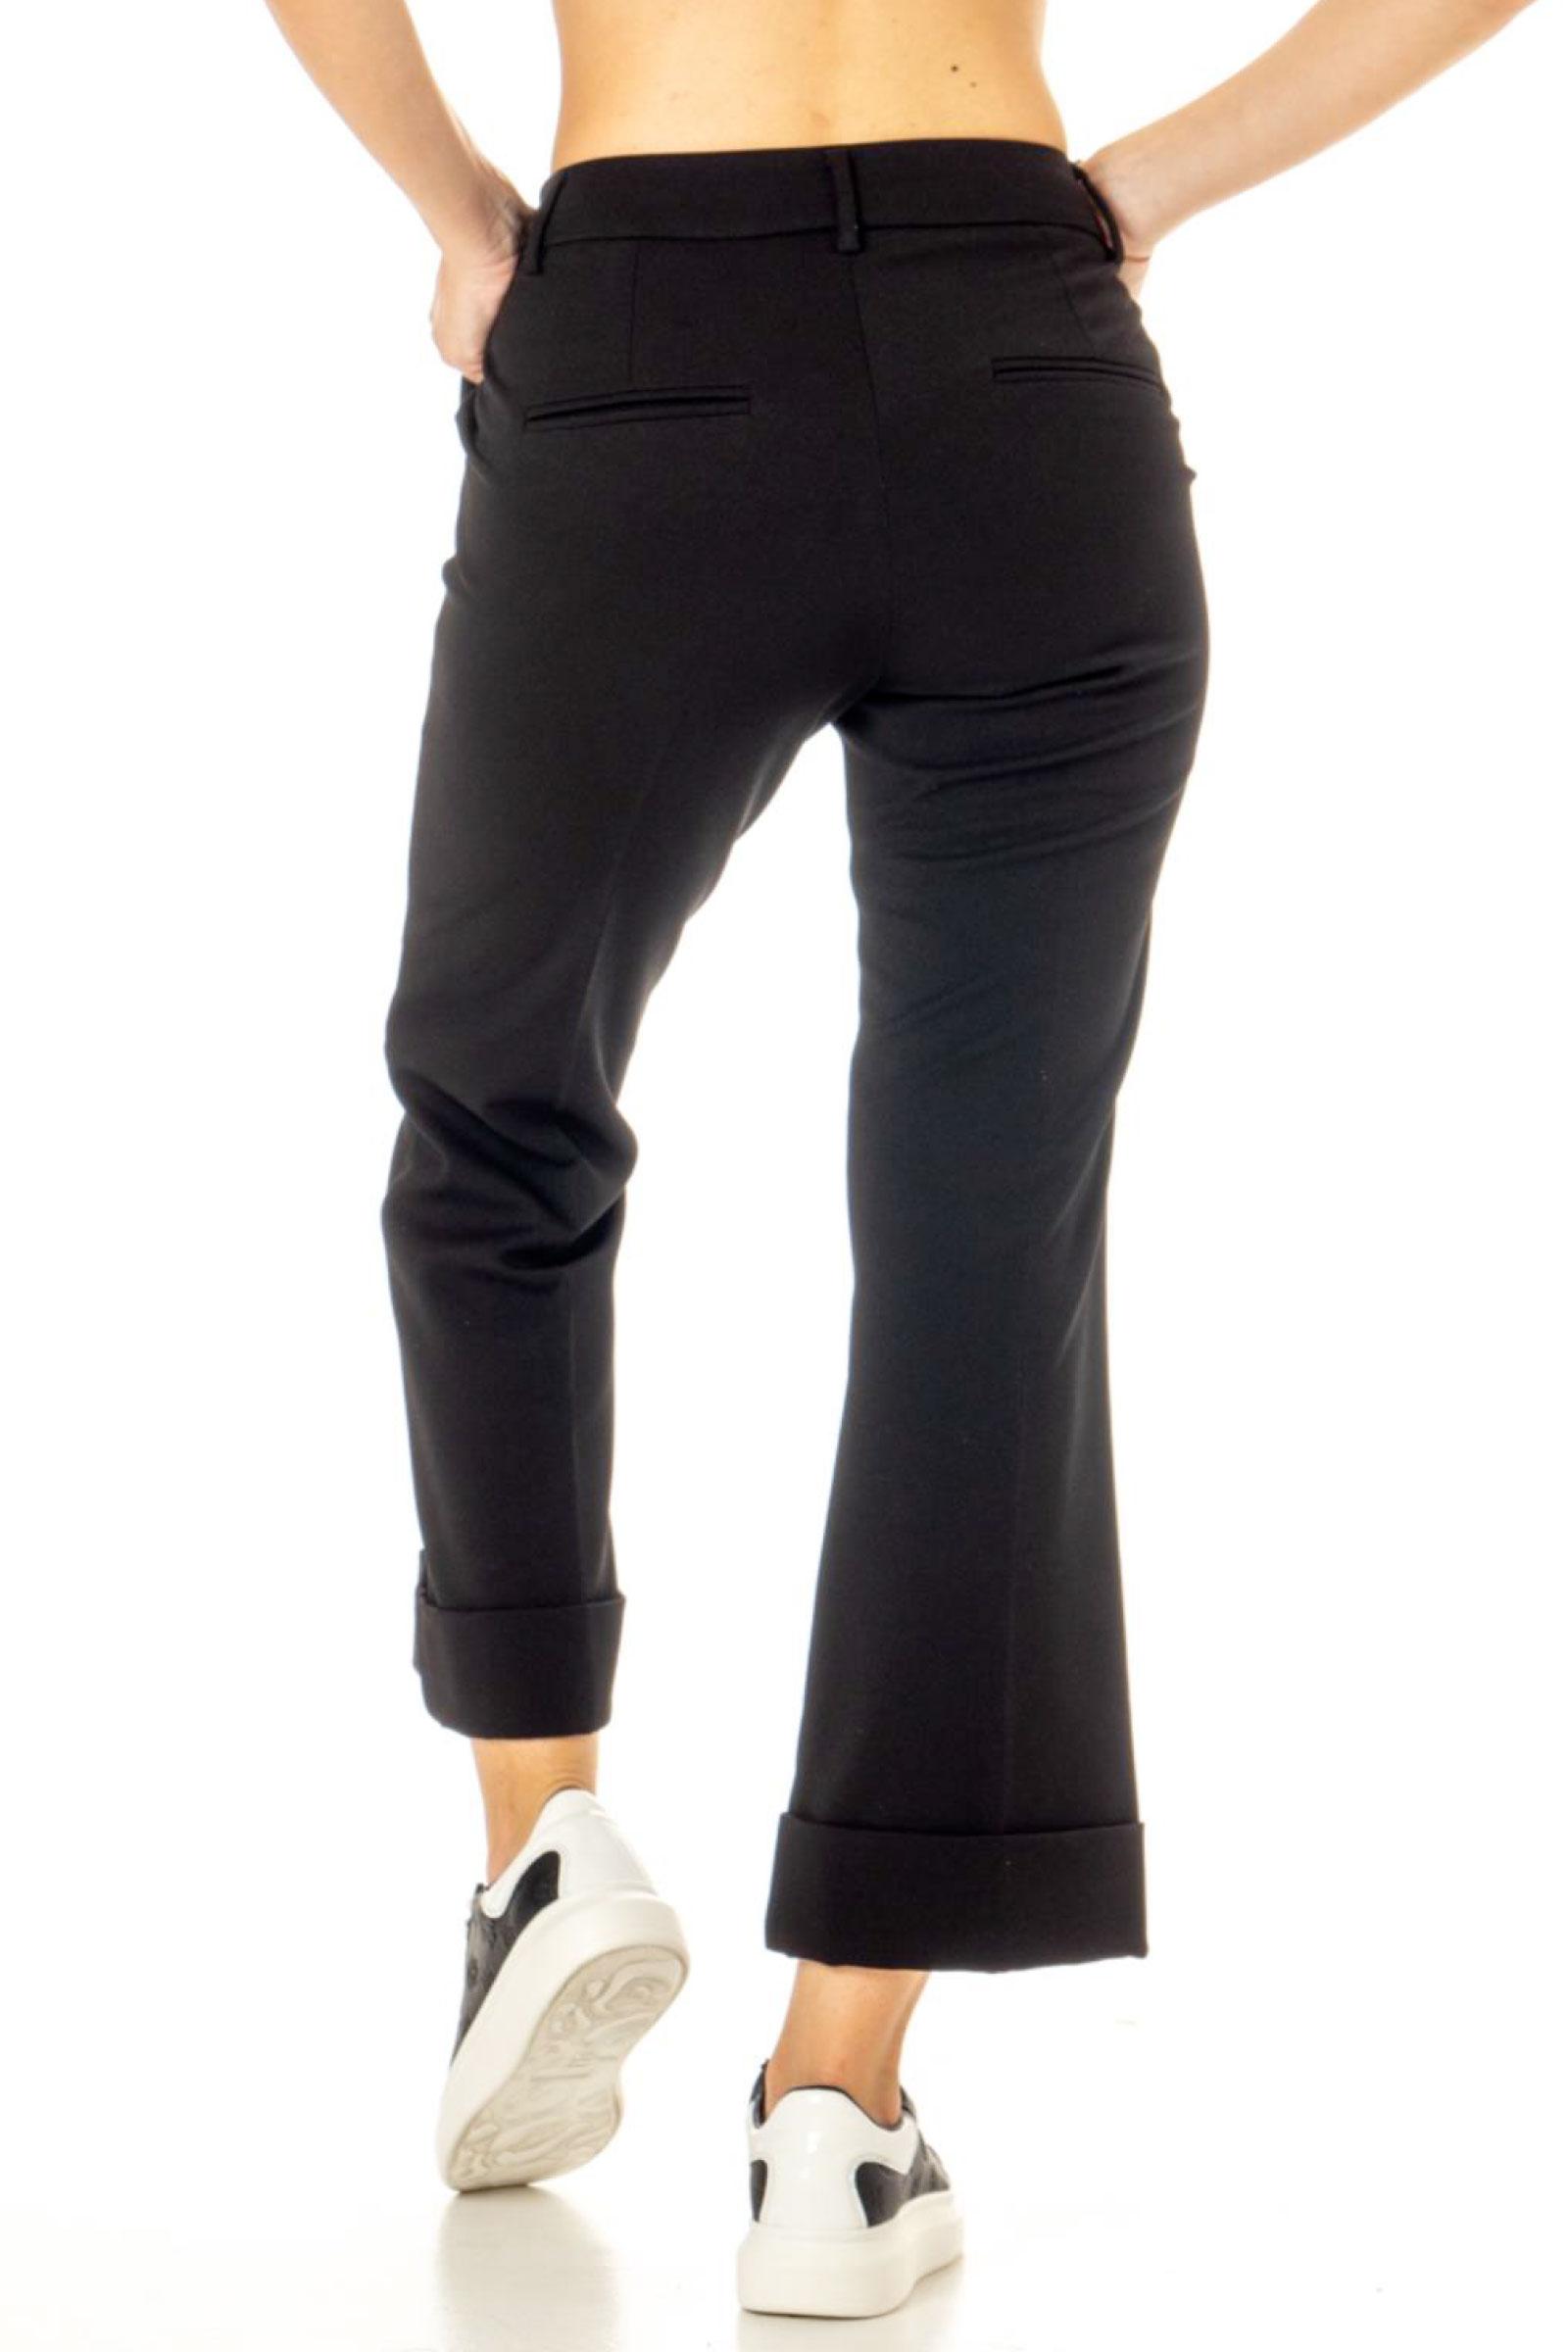 Pantalone Donna Modello VALLET EMME MARELLA | Pantalone | 51360819200003